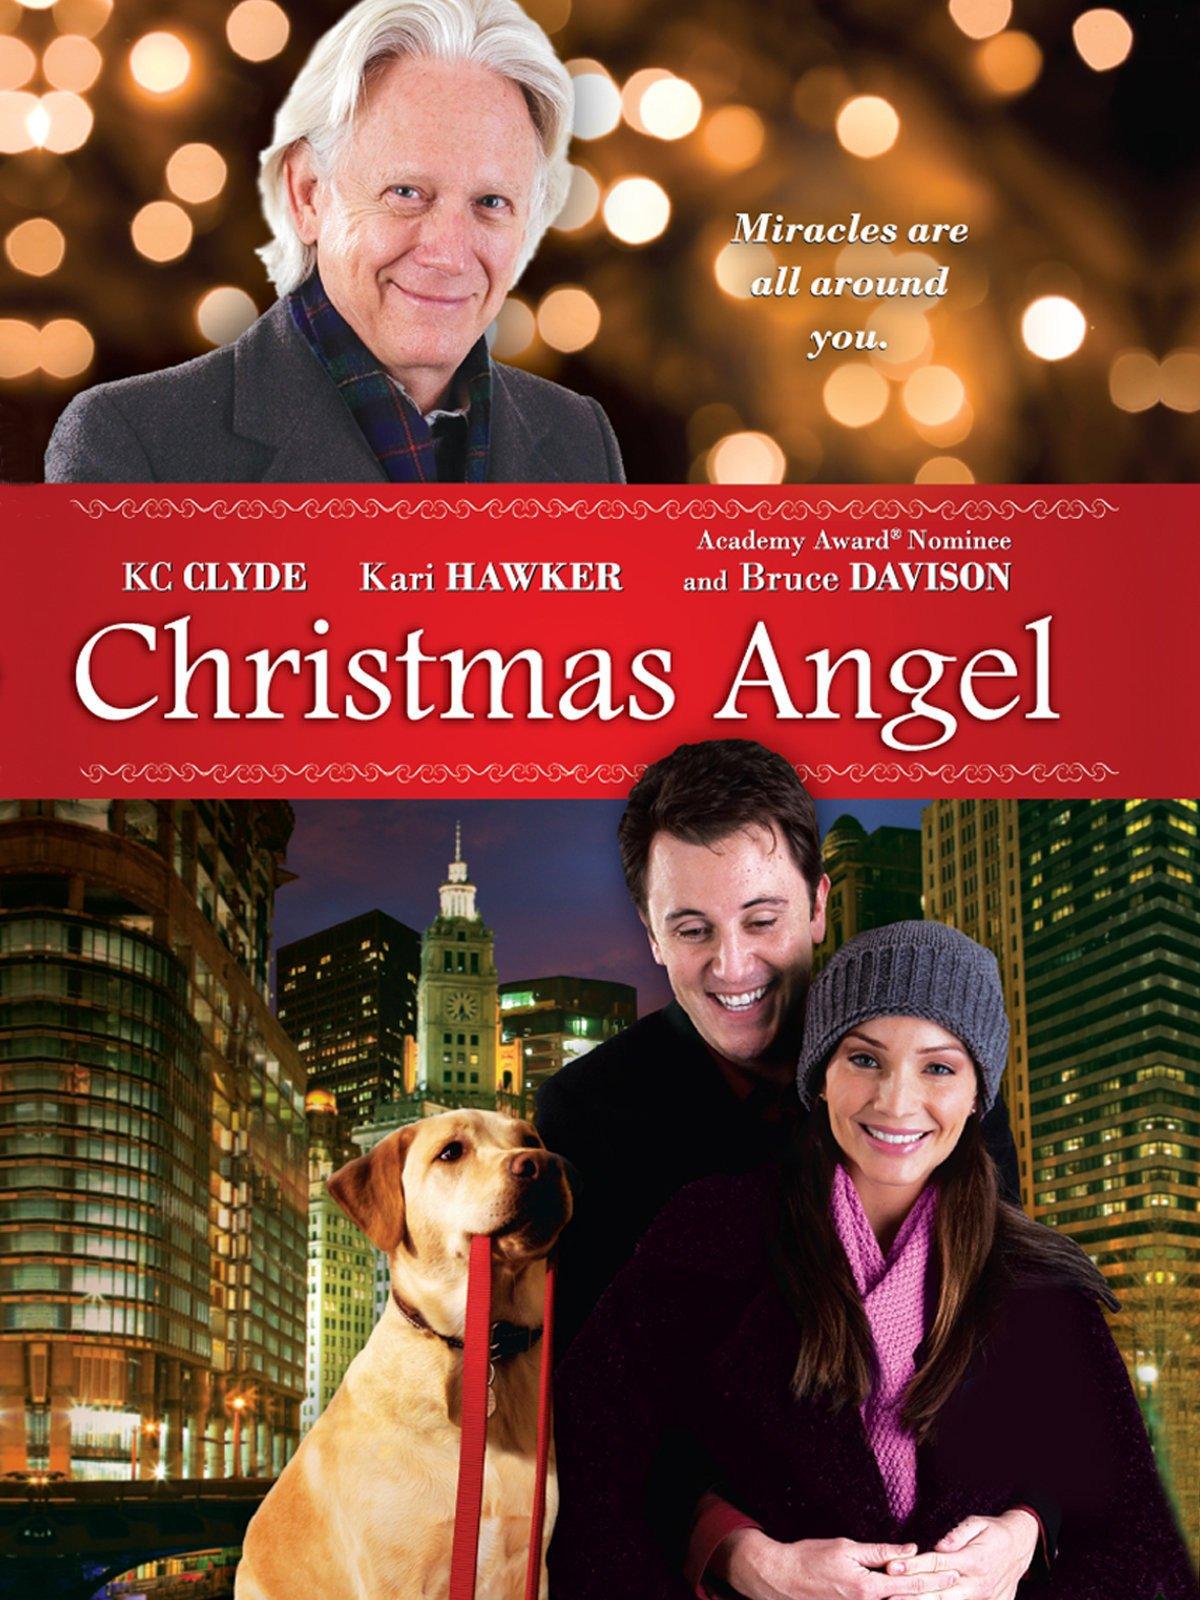 Amazon.com: Christmas Angel: Kari Hawker, Bruce Davison, KC Clyde ...